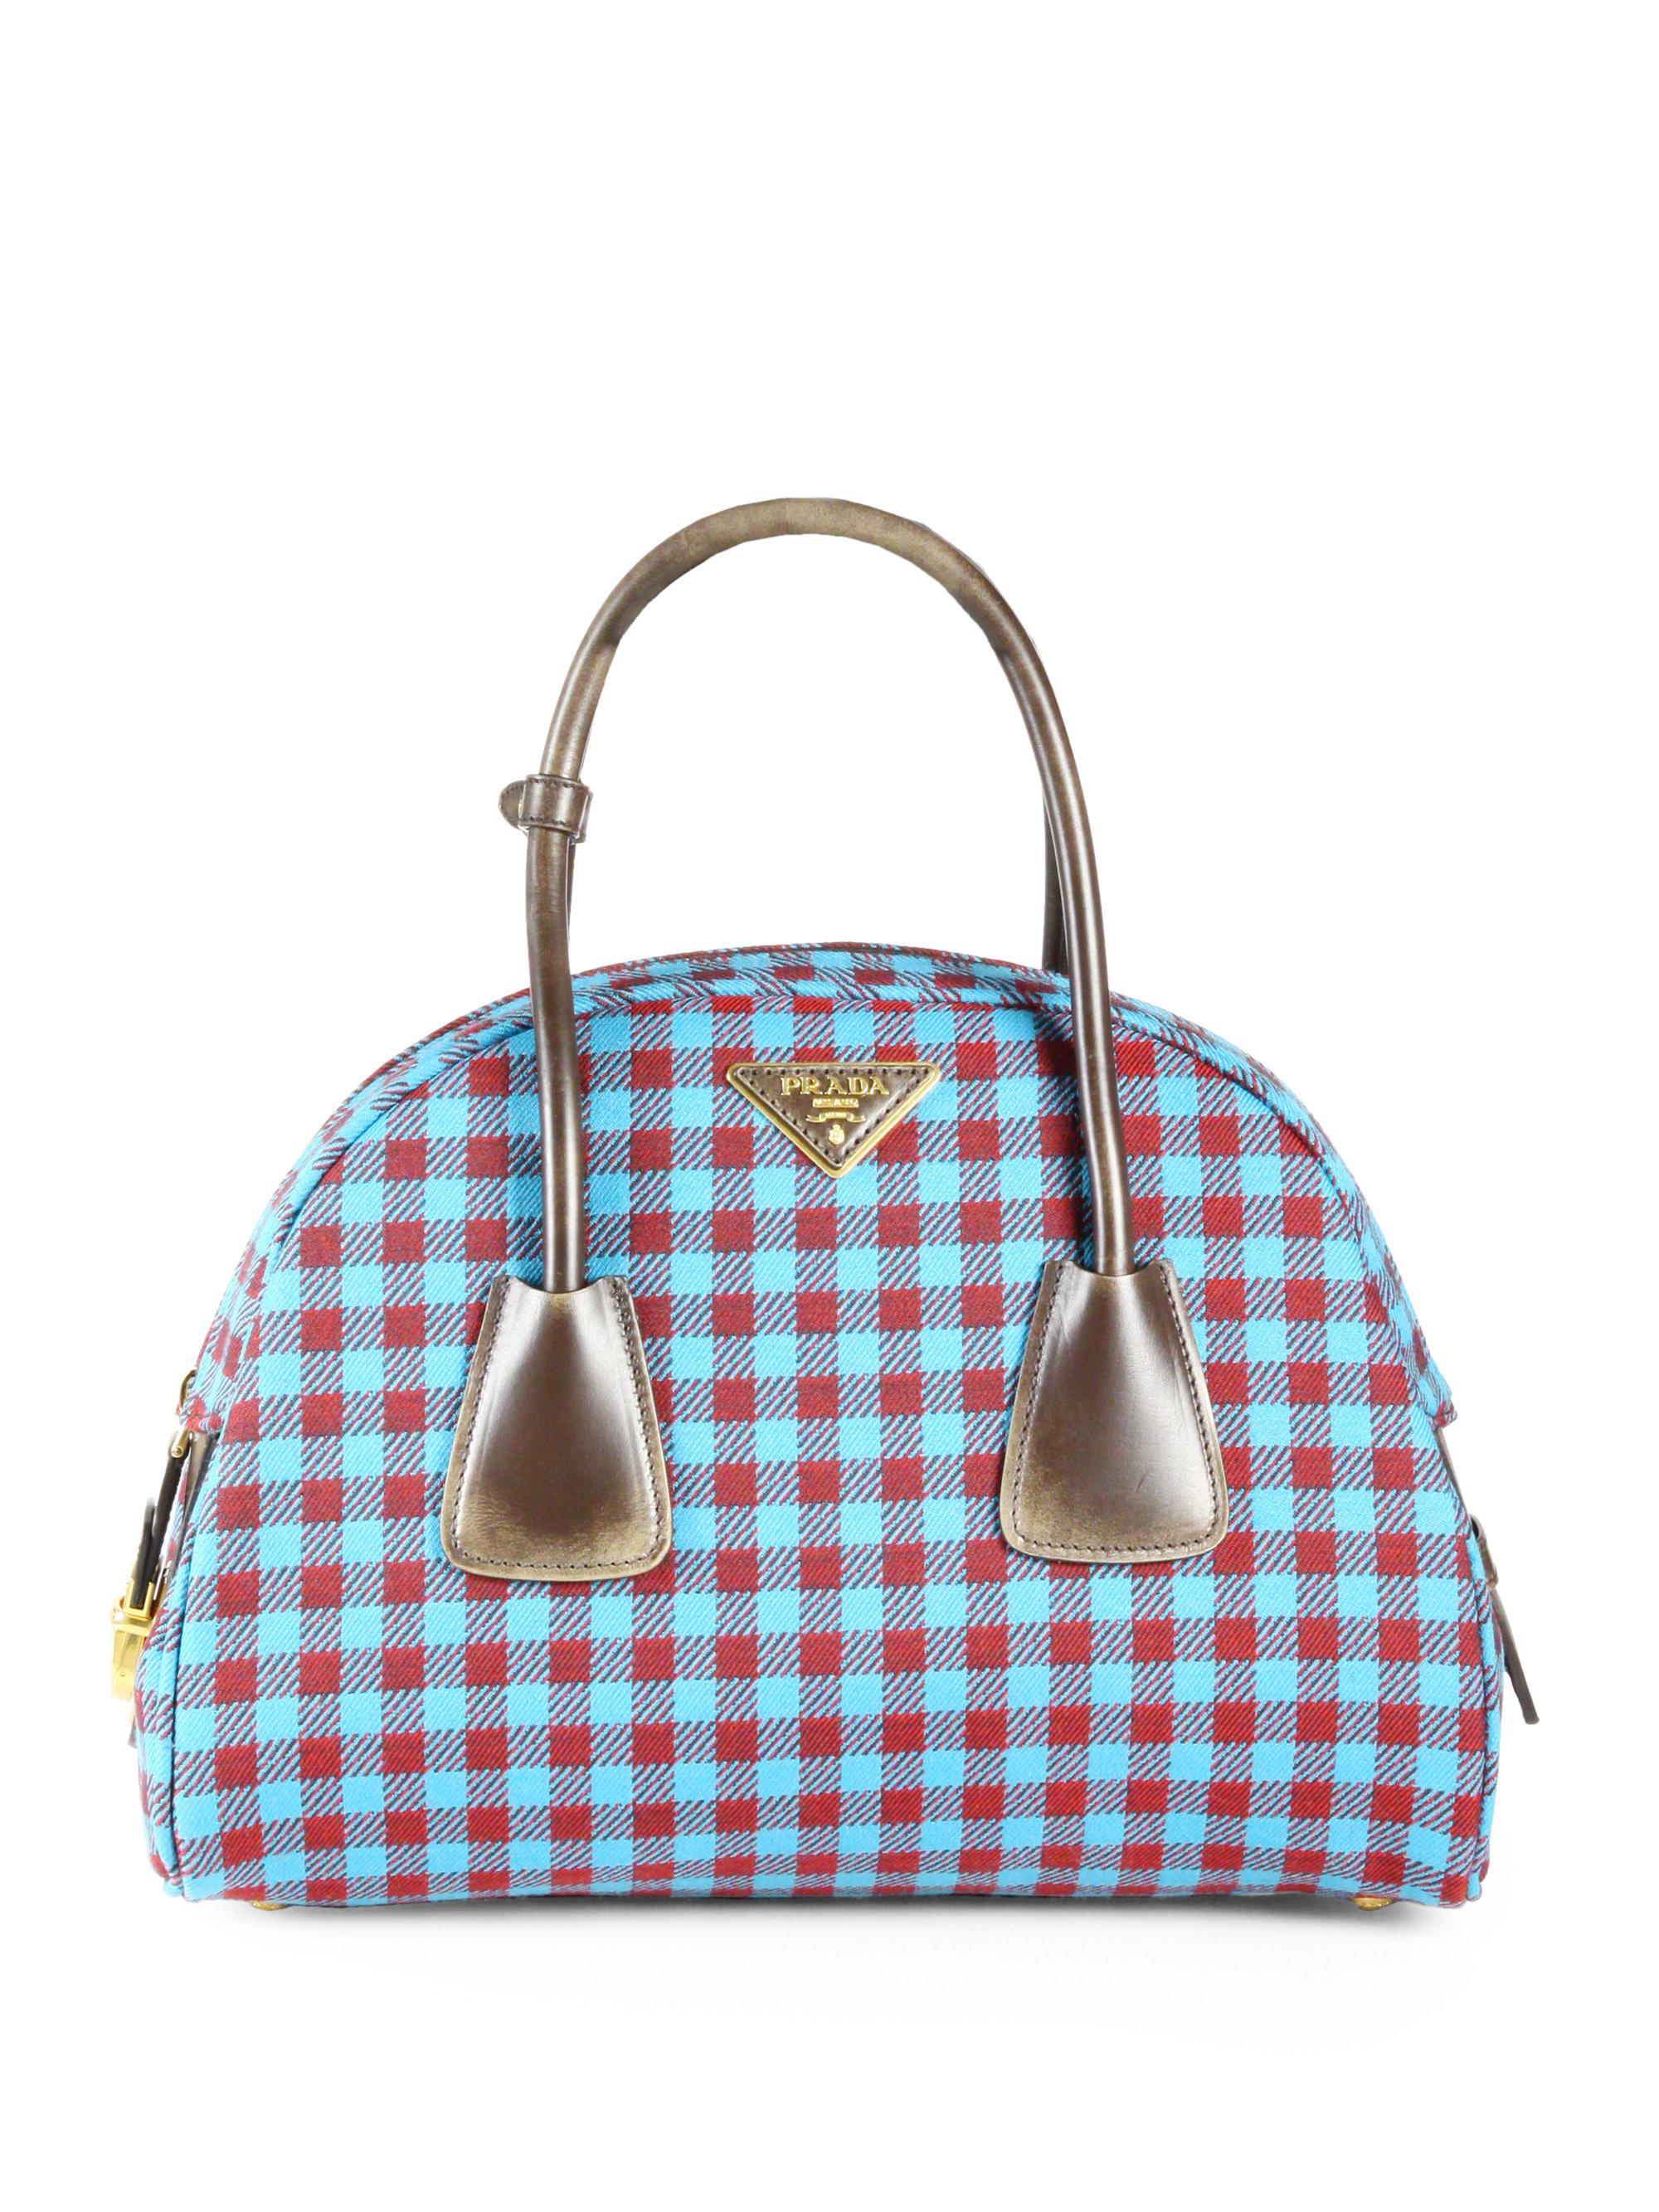 Lyst - Prada Jacquard Check Small Bowler Bag in Blue ecfcfd73e3dcc